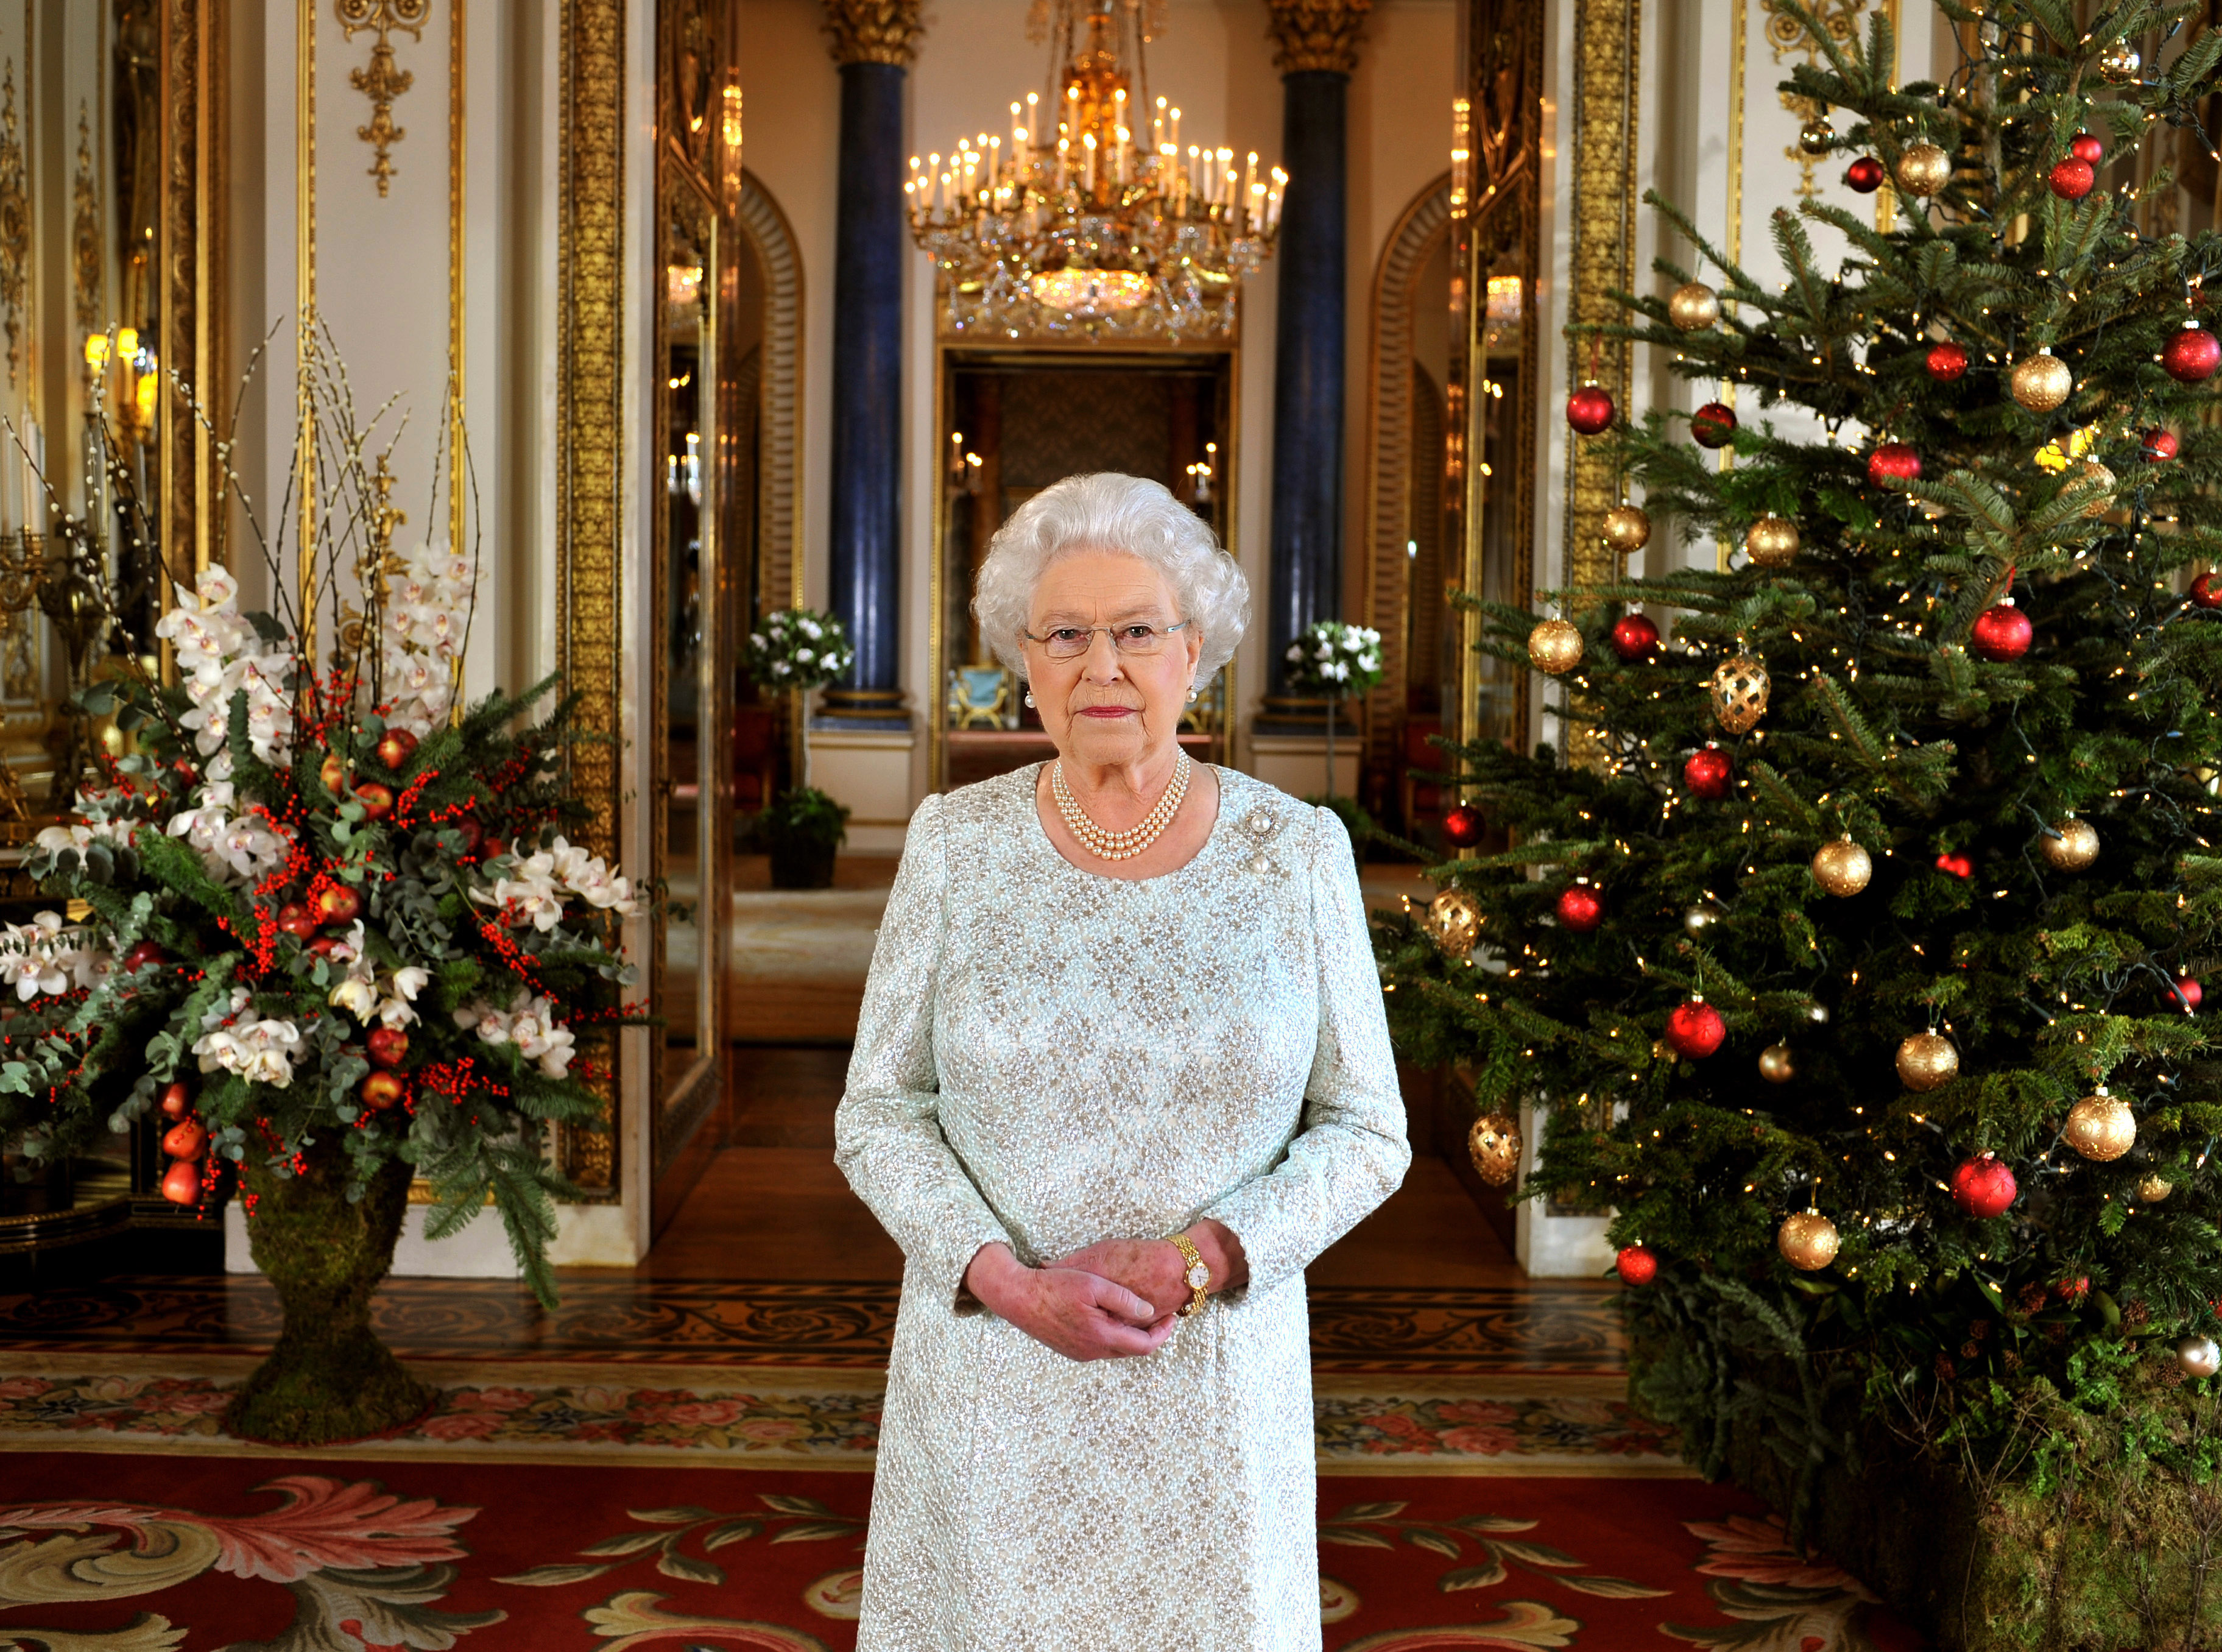 LONDON, UNITED KINGDOM - DECEMBER 07